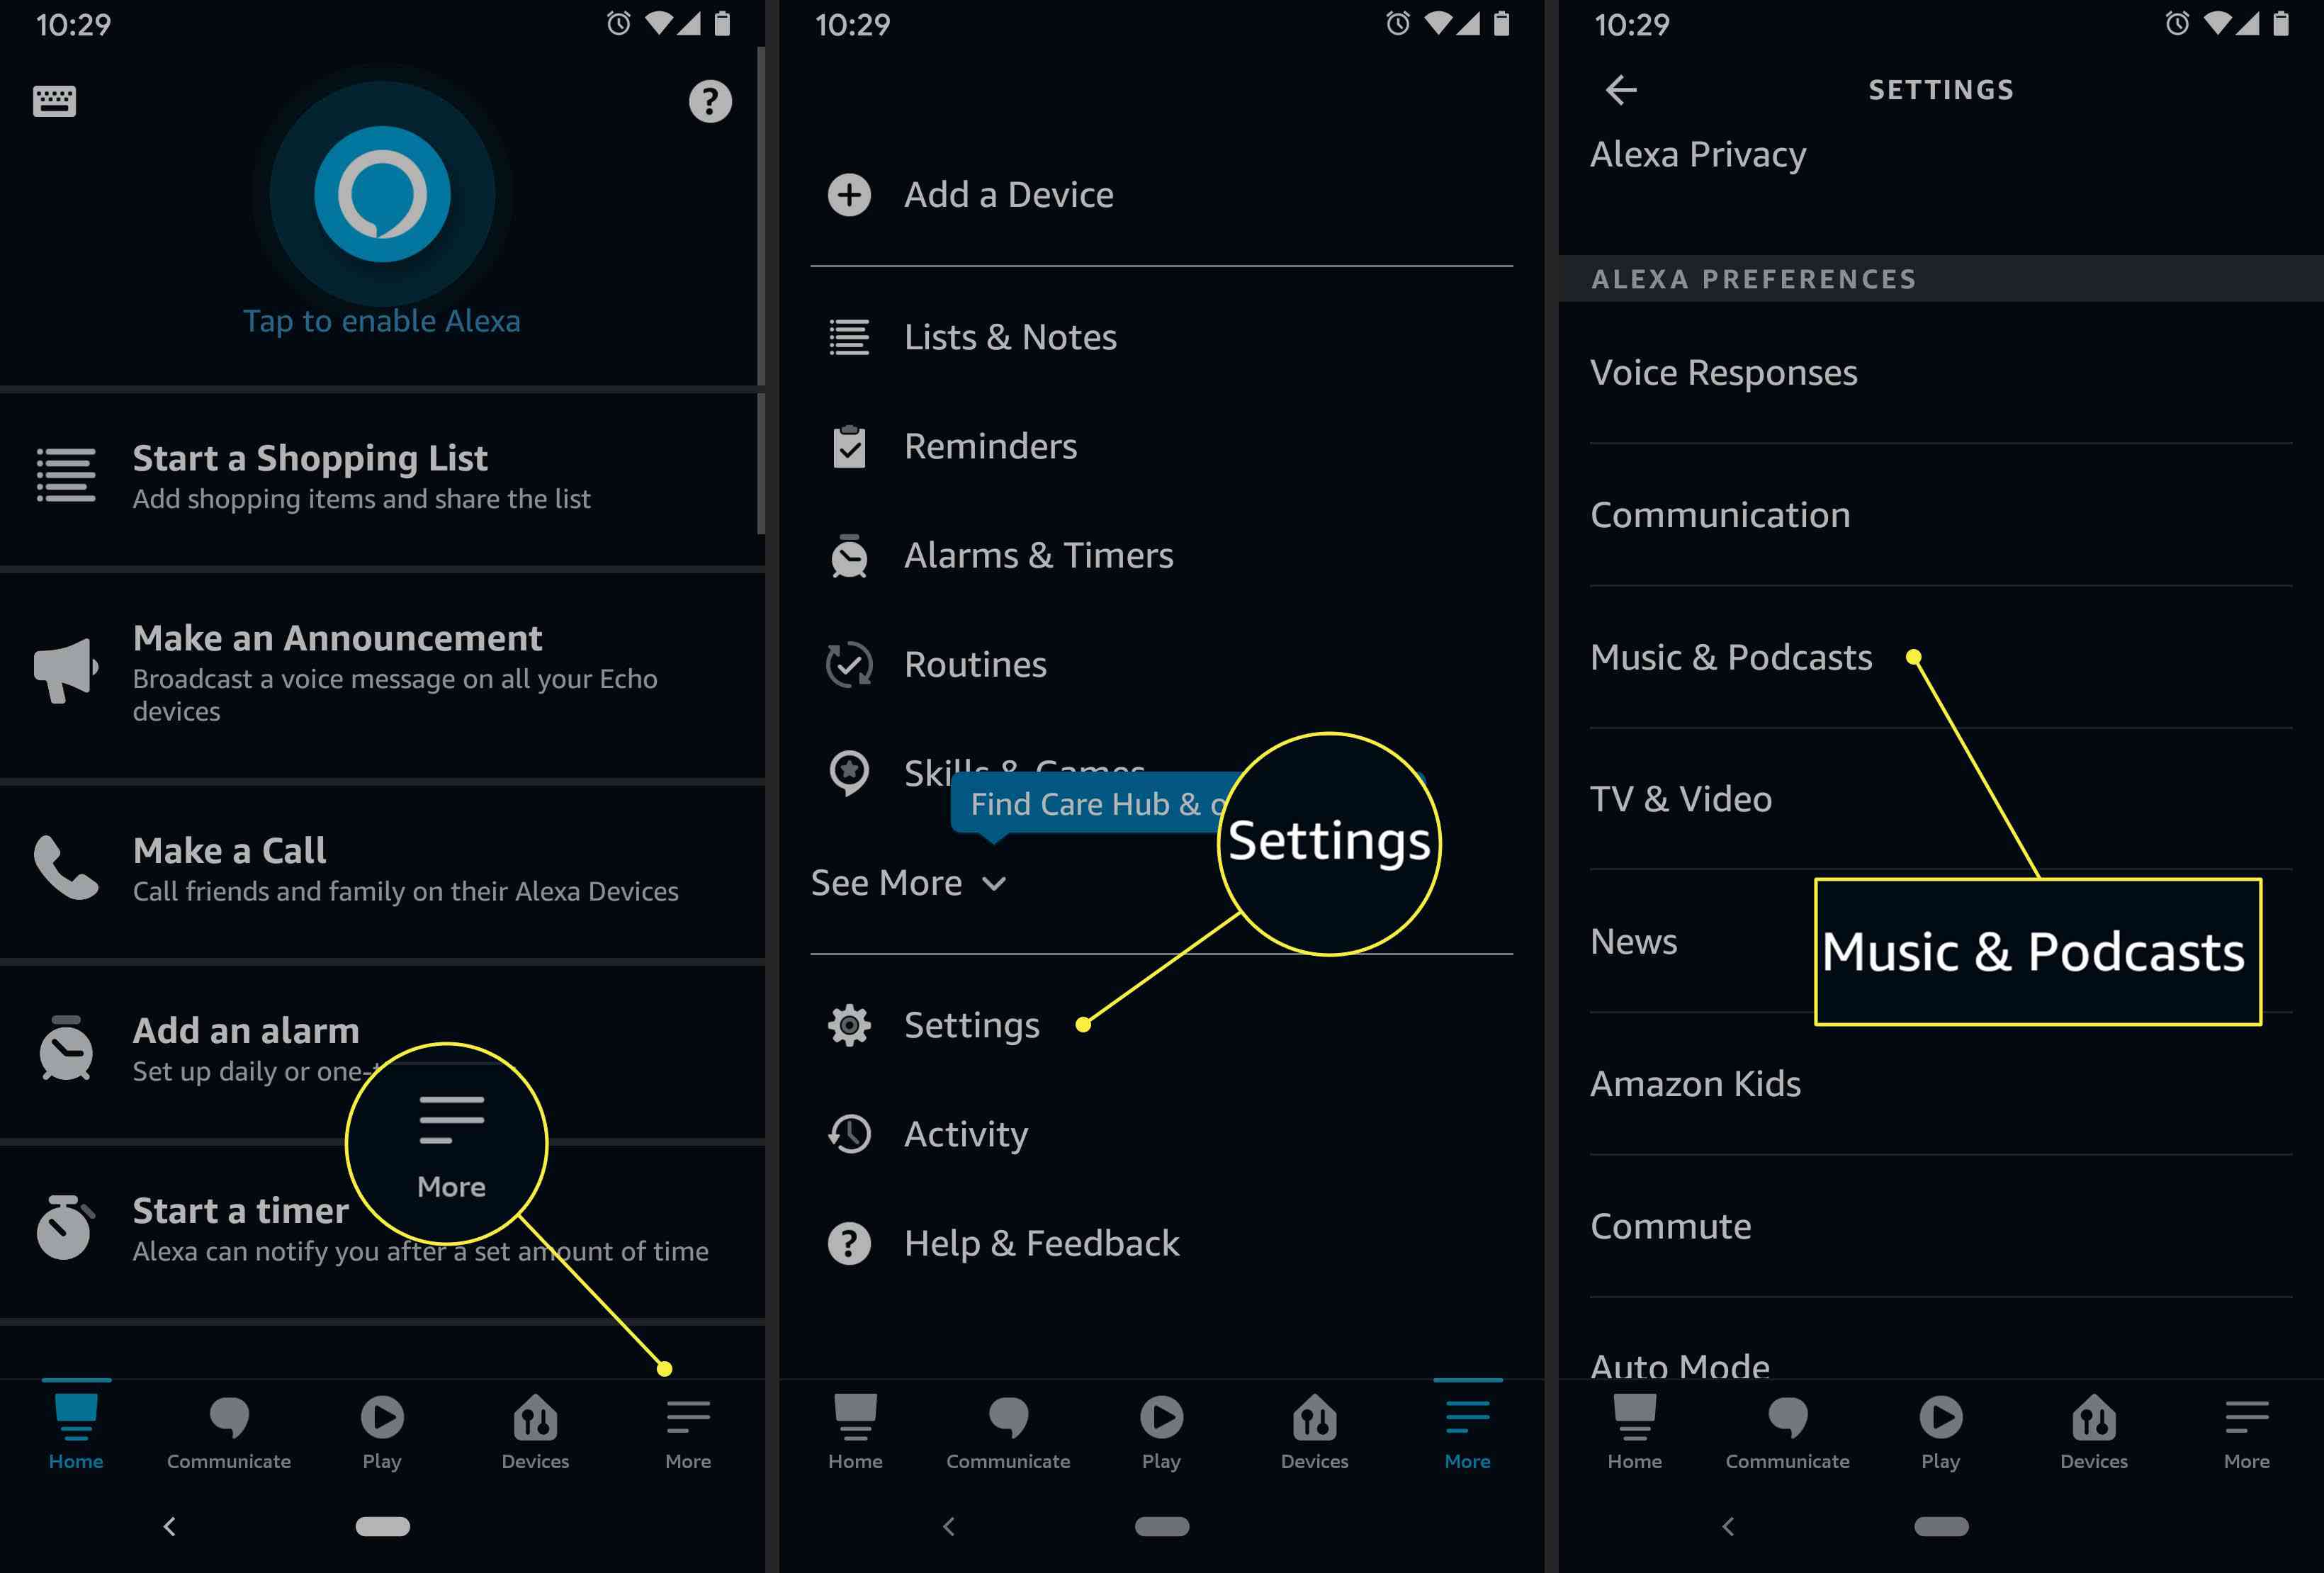 An Alexa app user accesses the Music & Podcasts settings menu